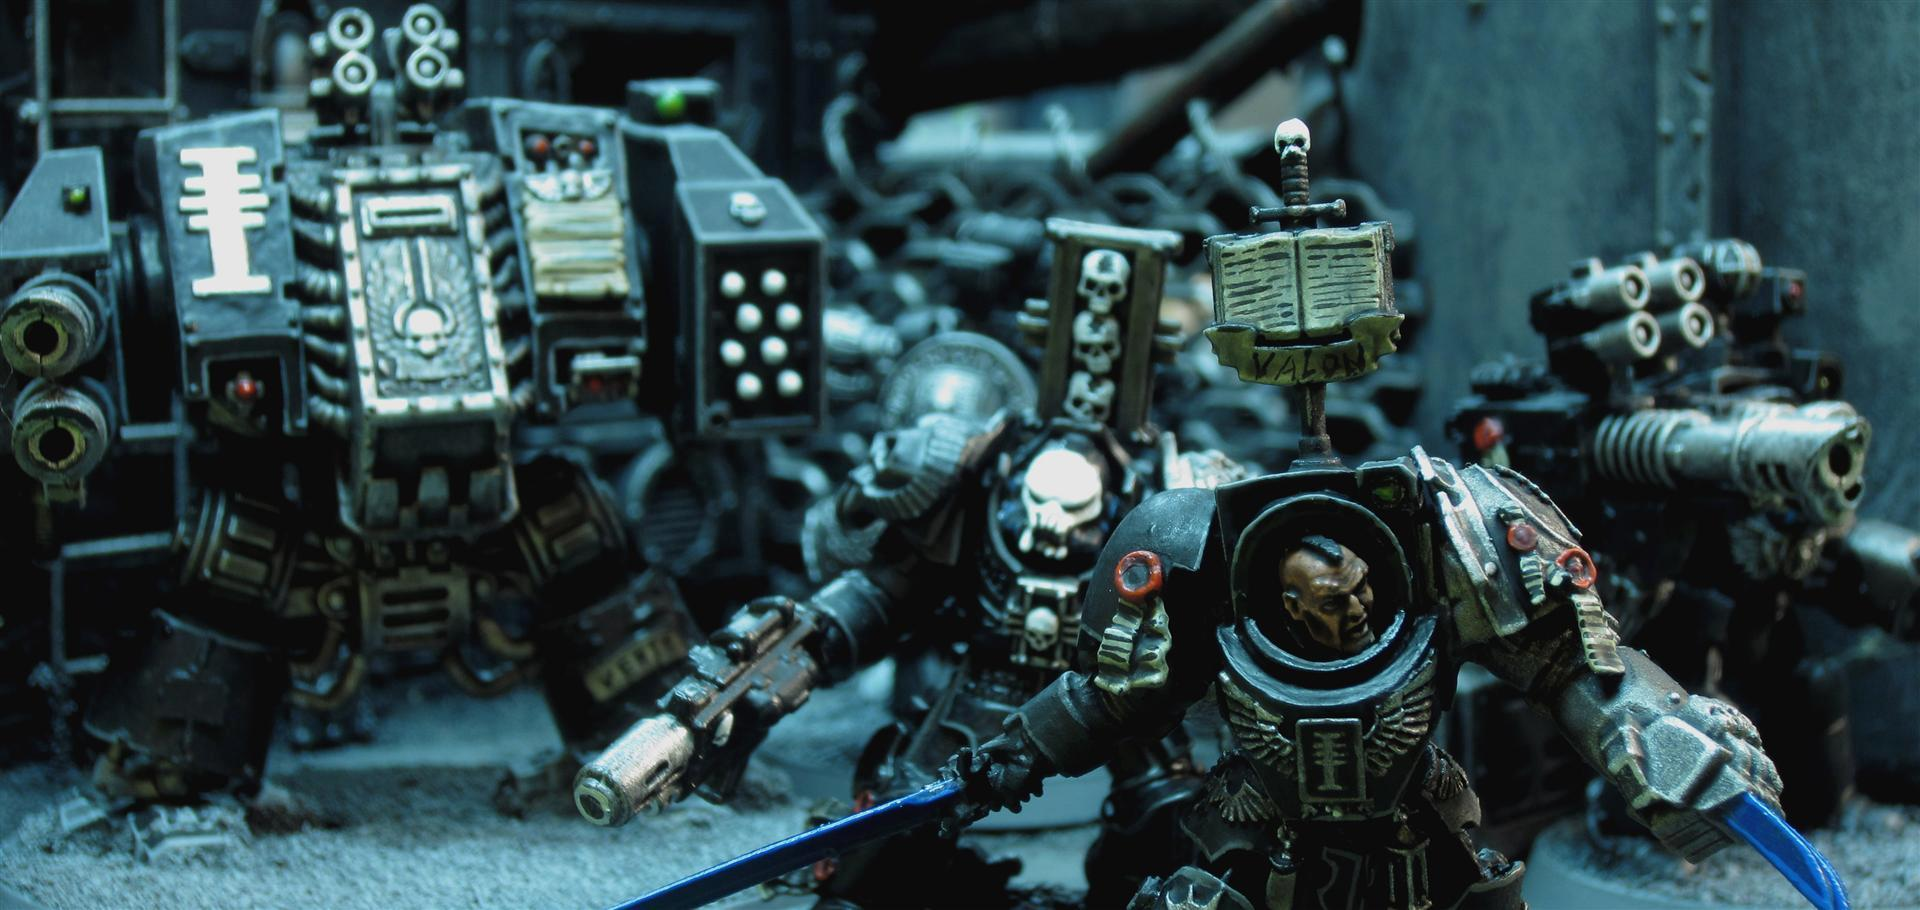 Alien Hunter, Alien Hunters, Black Shield, Black Shields, Blackshields, Death Watch, Deathwatch, Inquisition, Inquisitor, Ordos Xenos